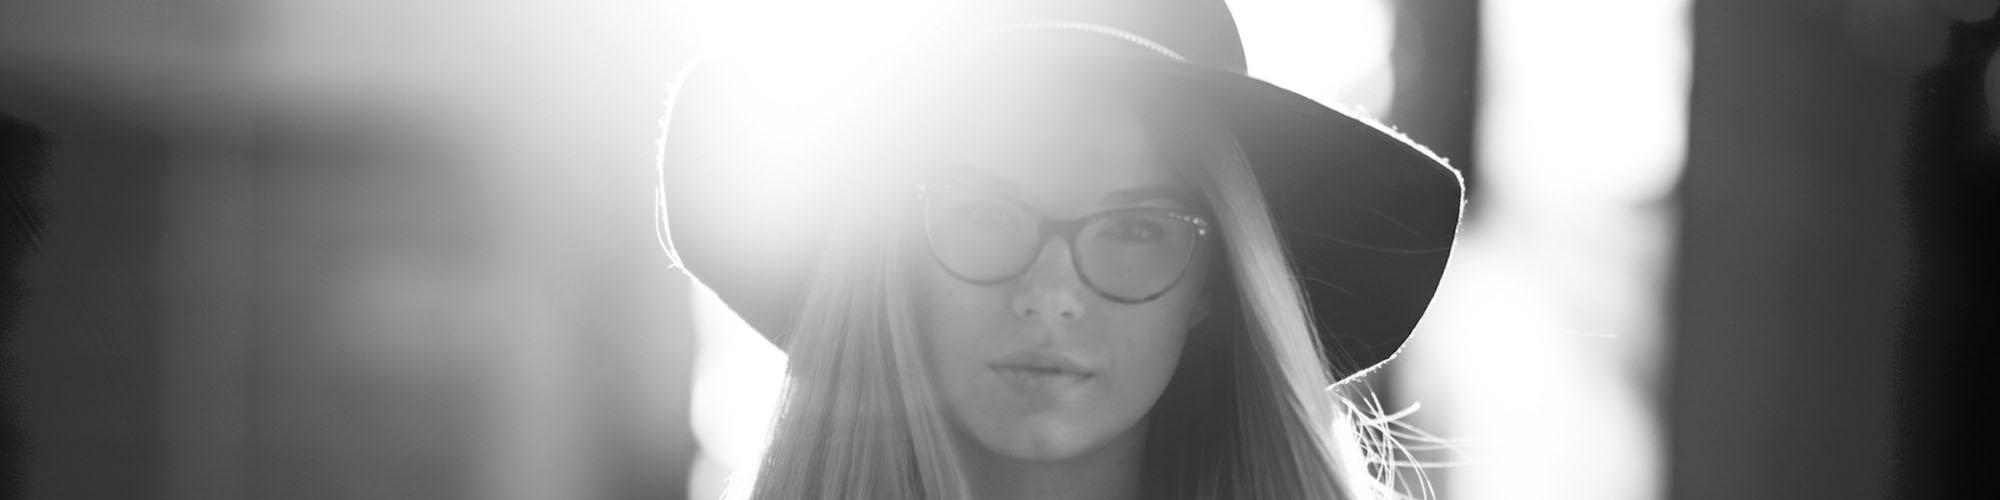 BB_Child-Fashion-glasses-20years